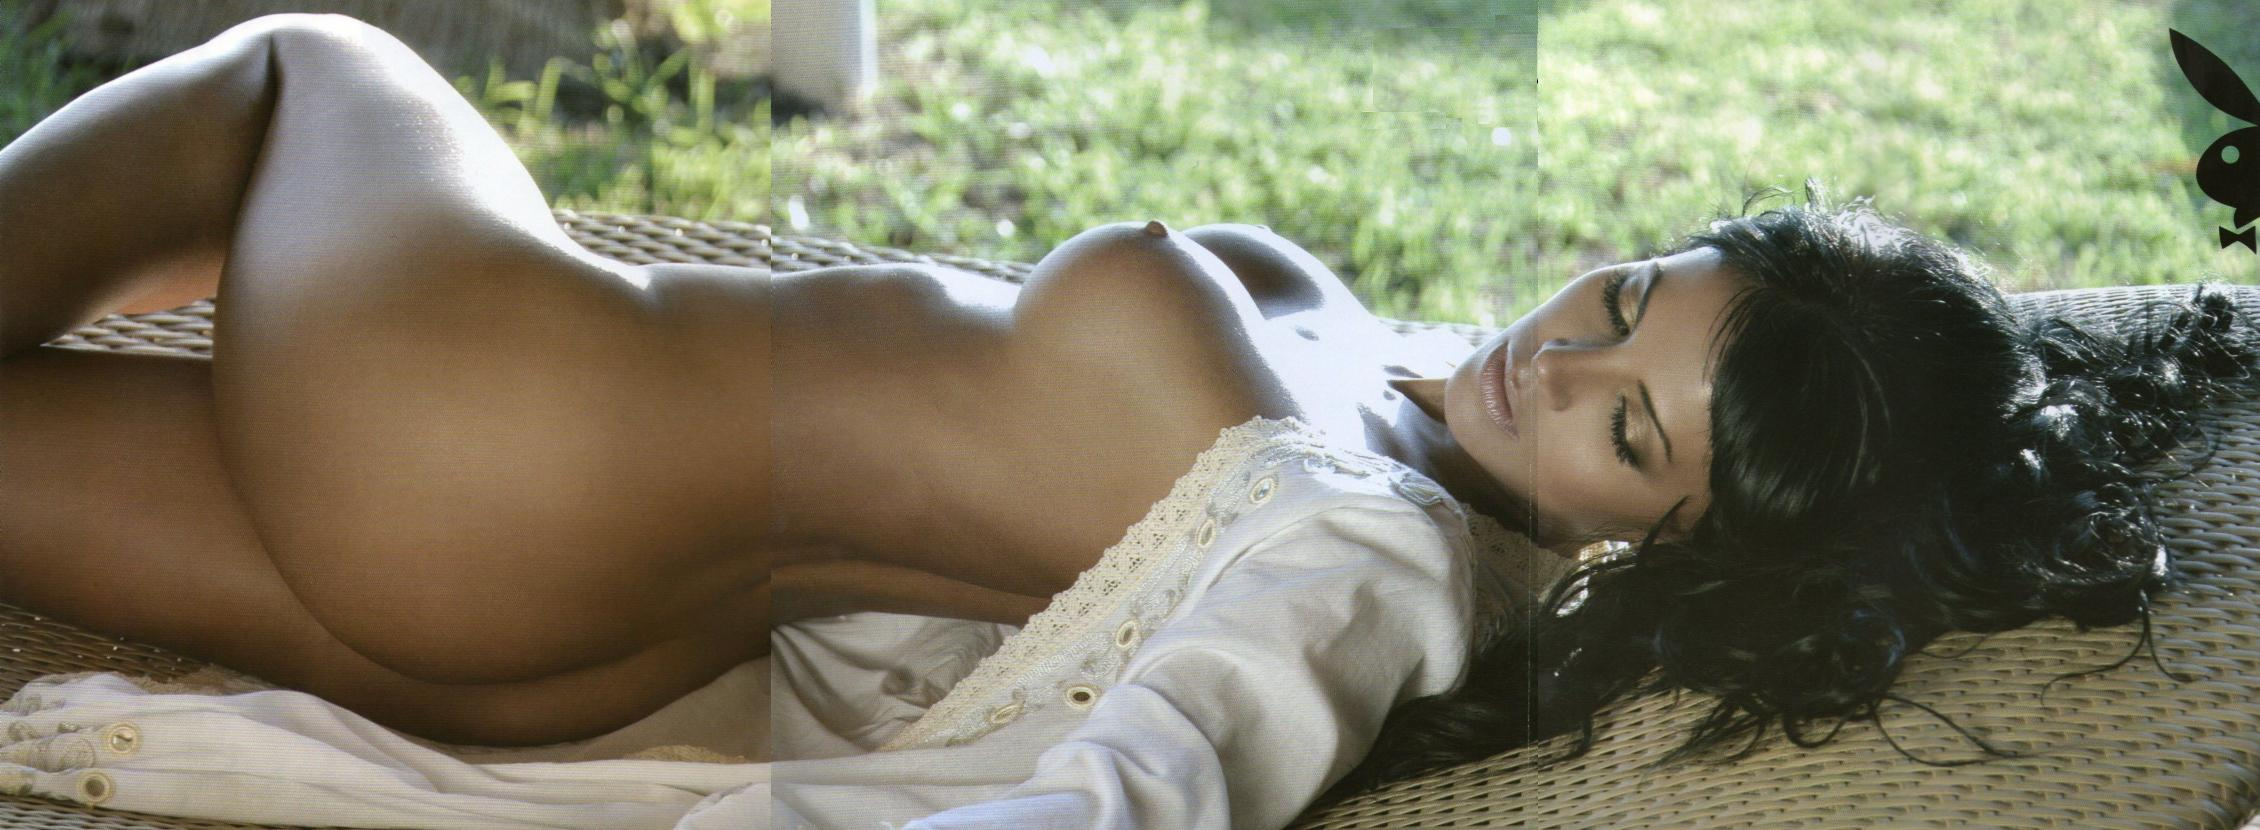 Vanessa Arias sin ropa interior